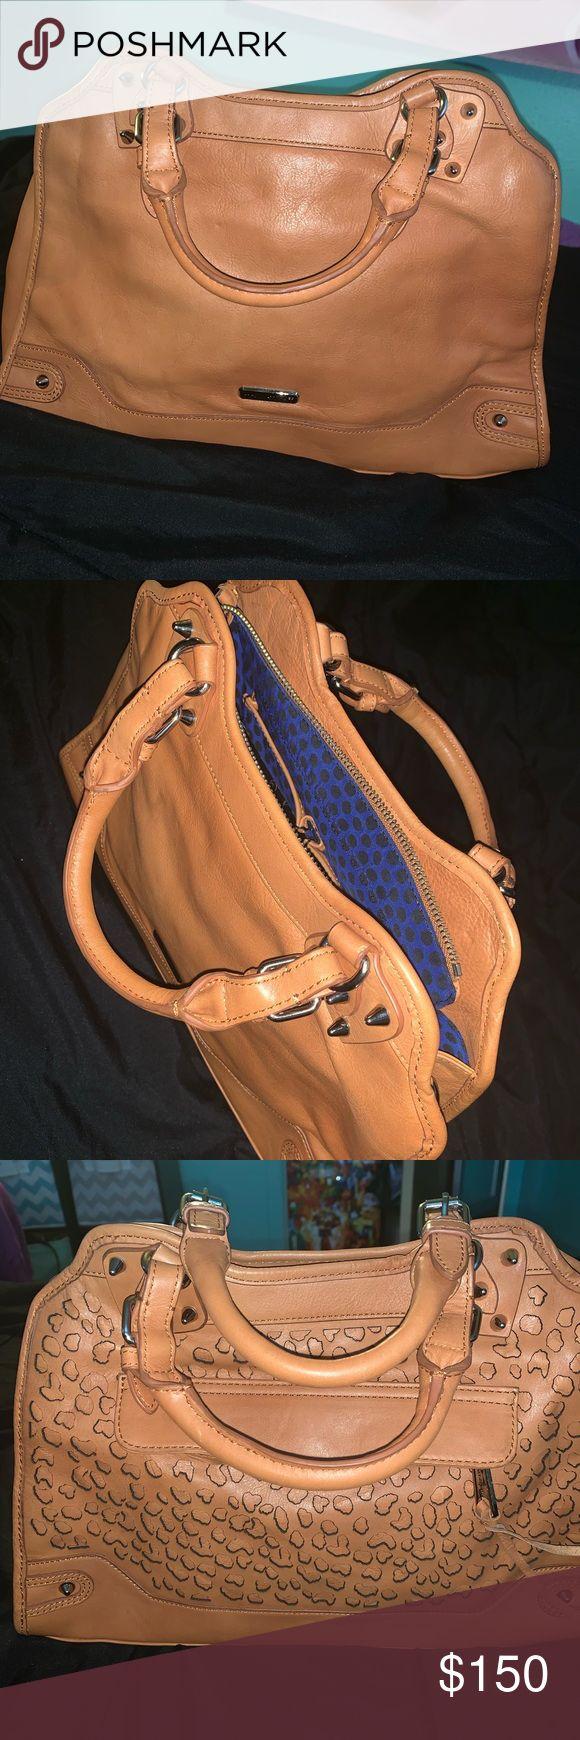 Kenneth Cole Jacket   Fashion, Clothes design, Fashion trends